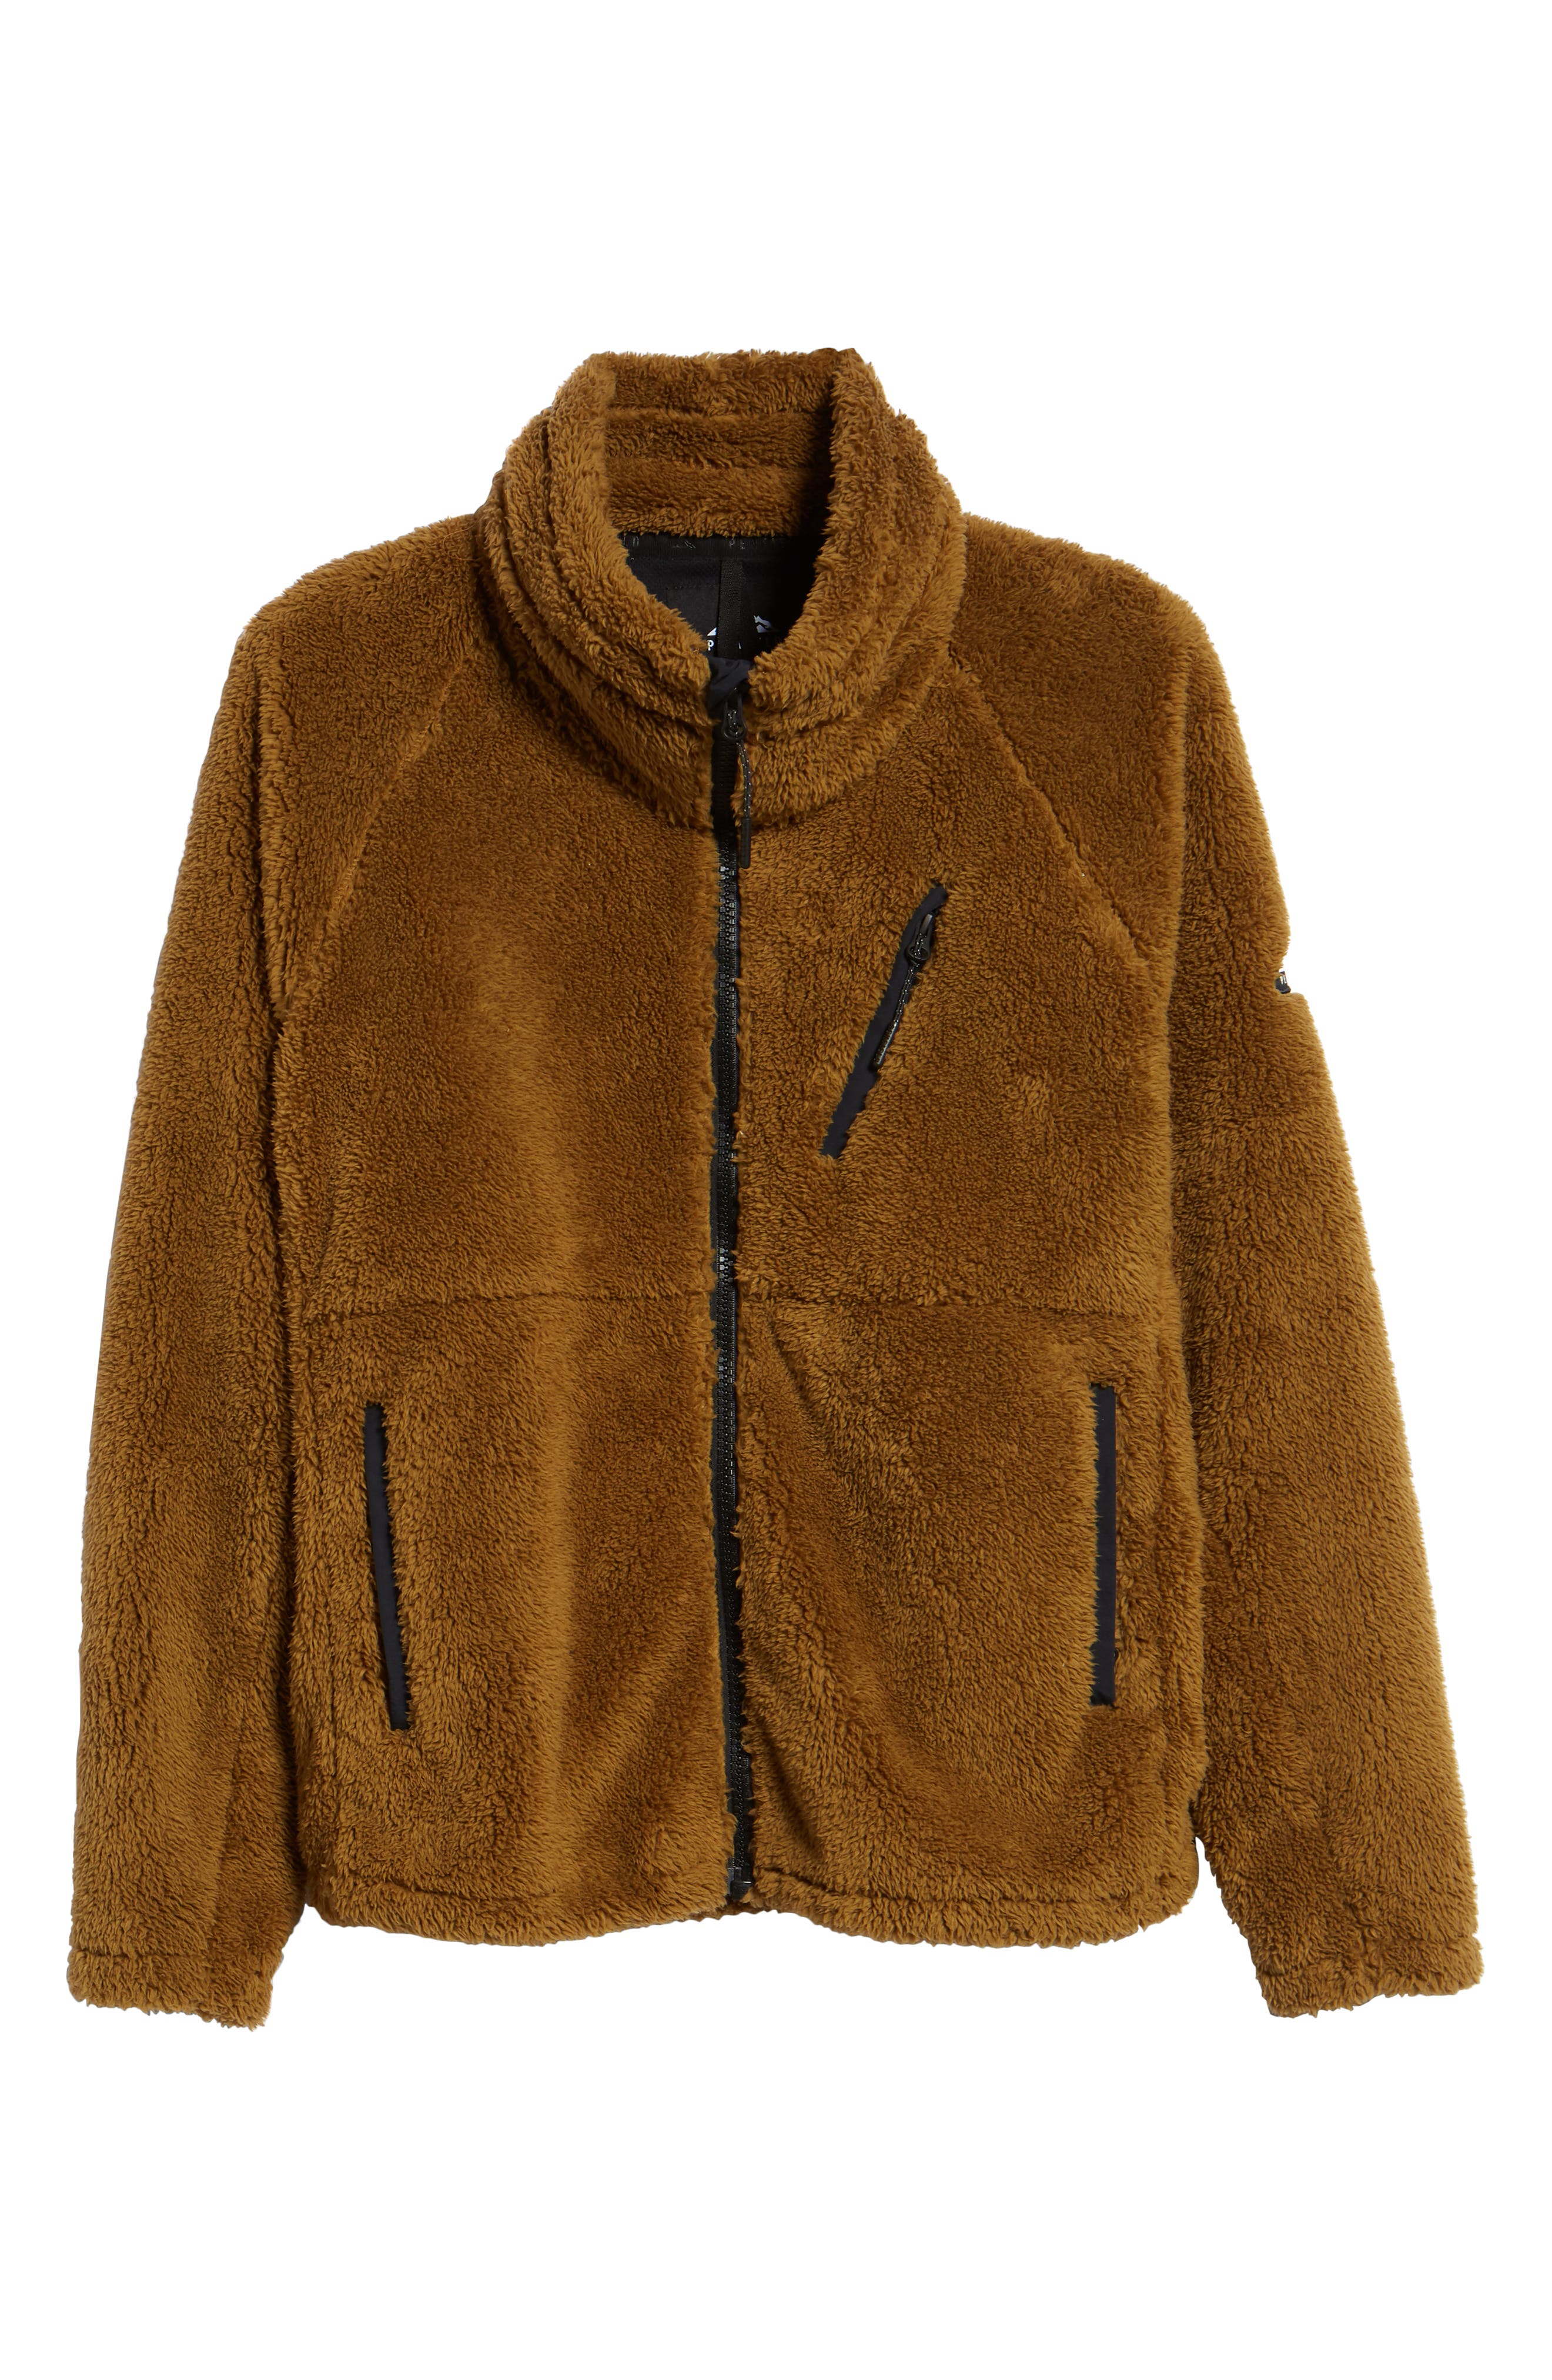 Breakheart Zip Fleece Jacket,                             Alternate thumbnail 6, color,                             BREEN